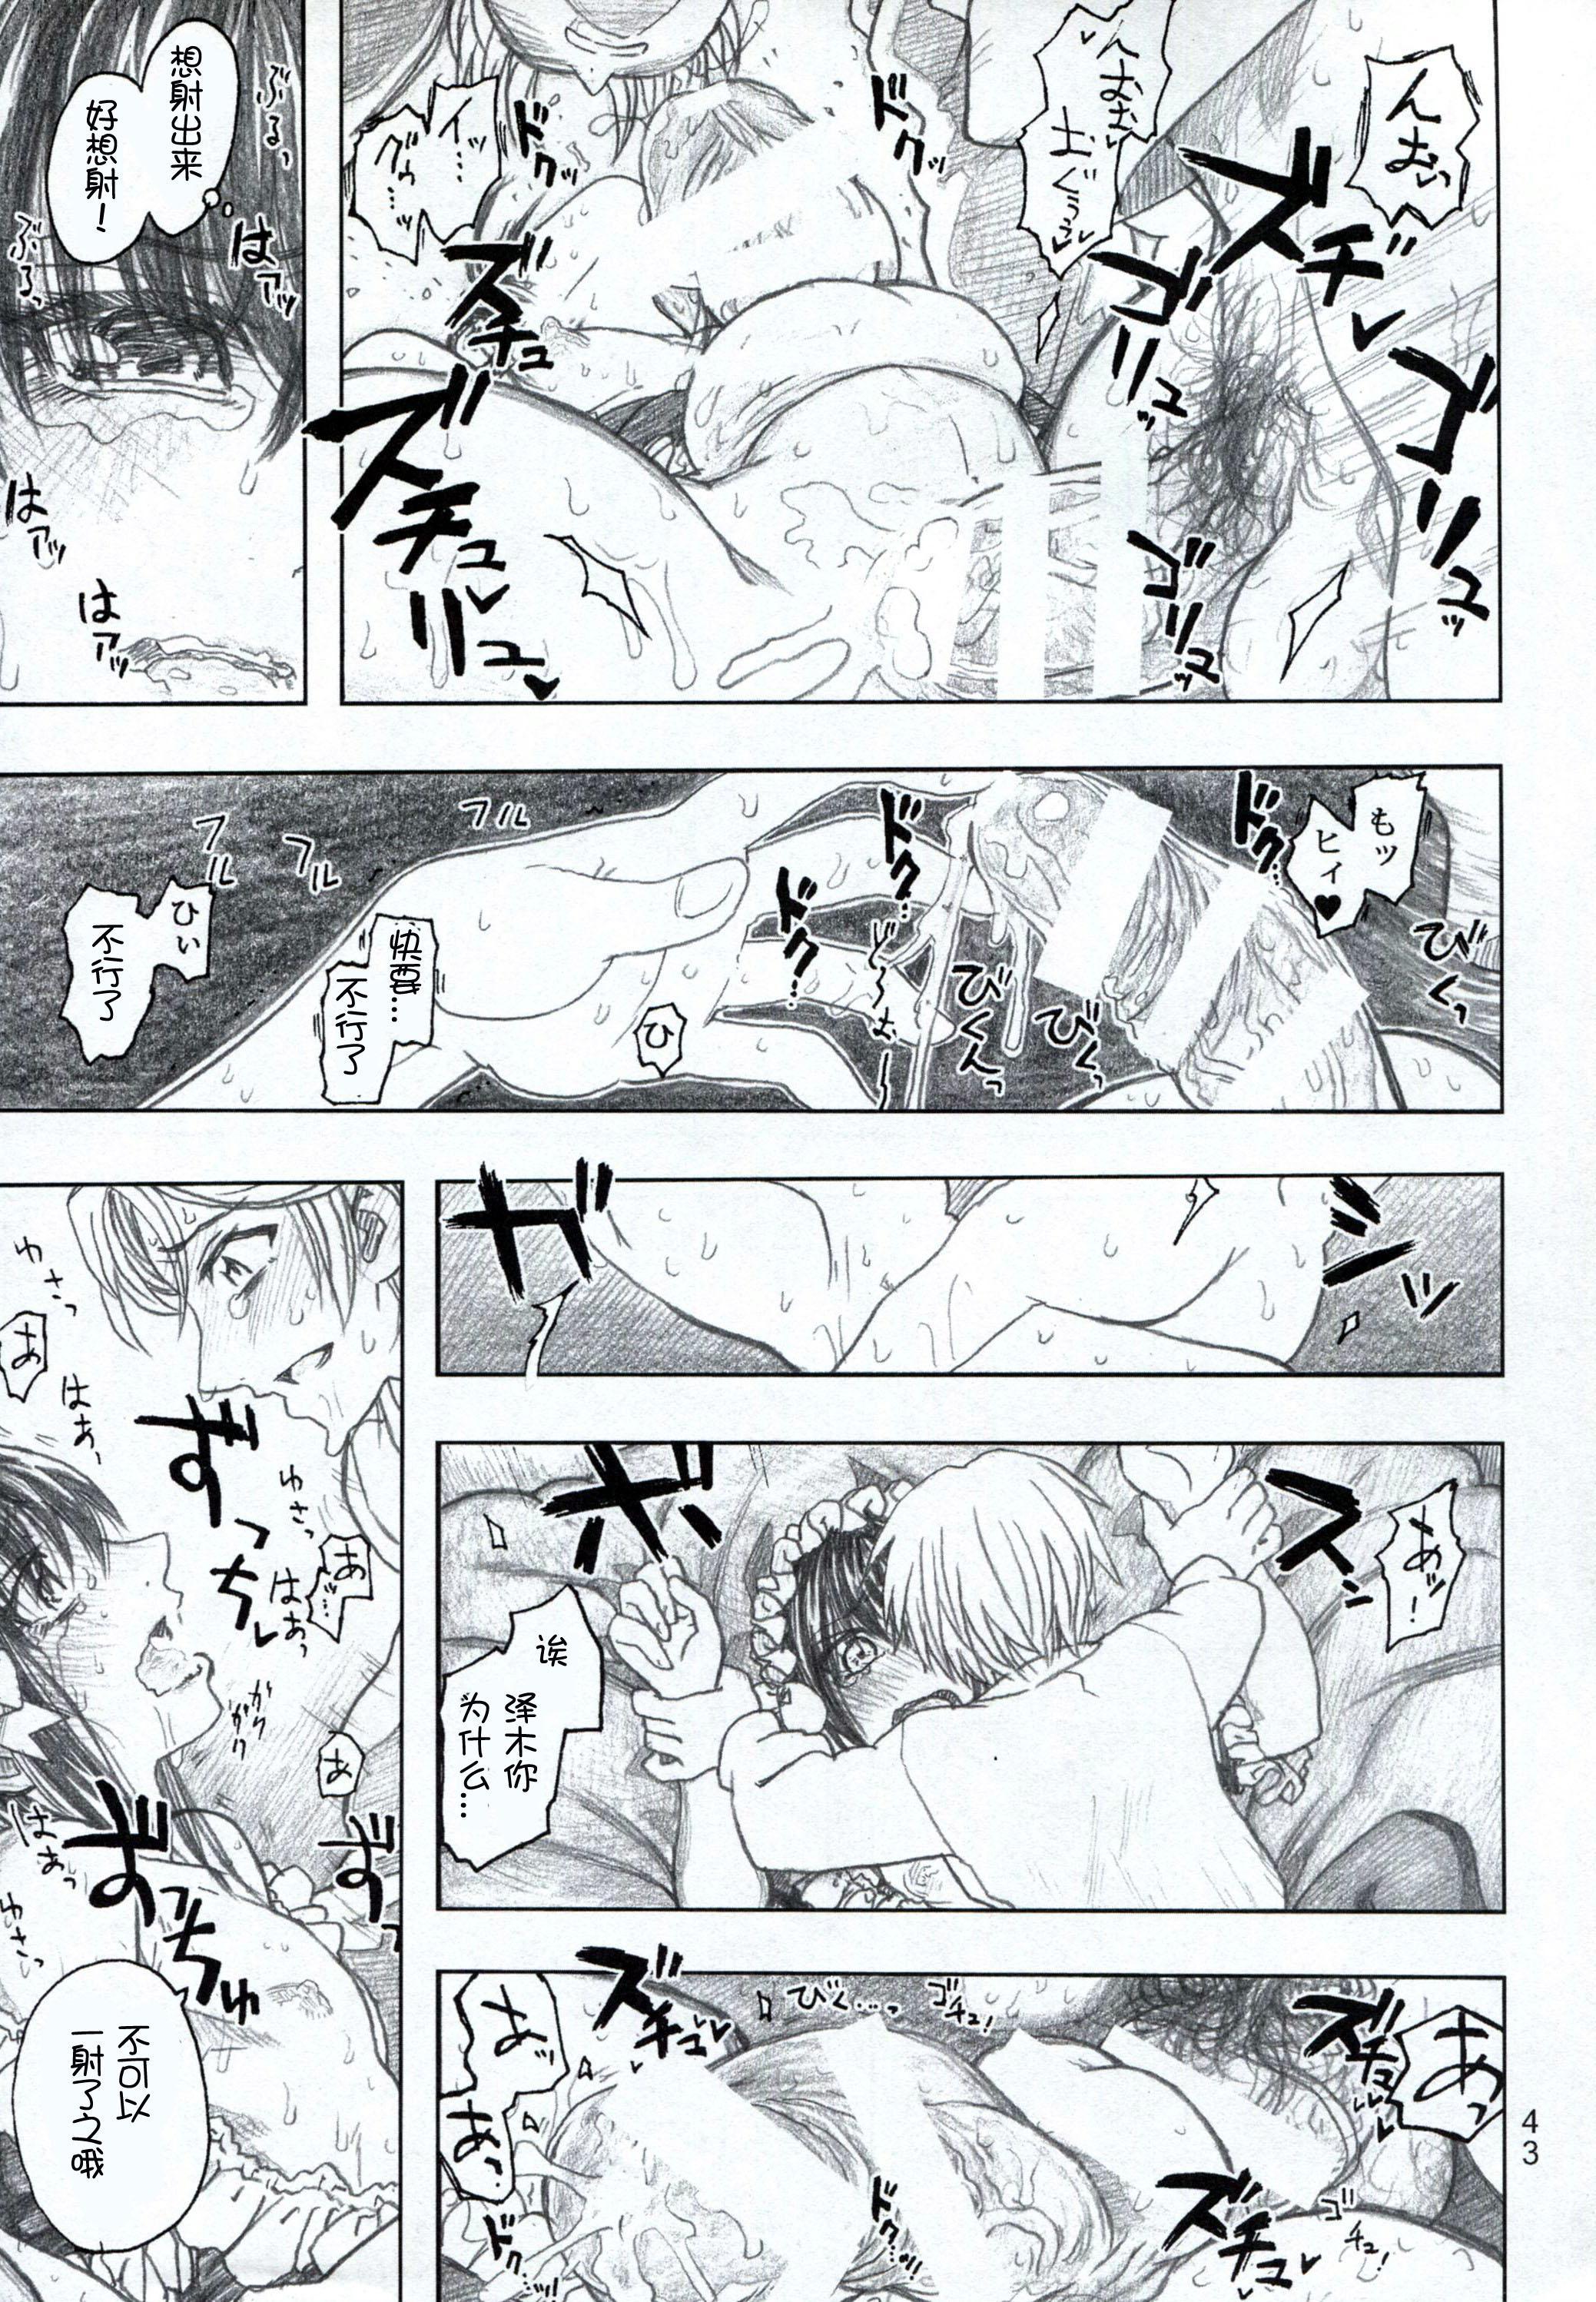 Moyashimon 2 TALES OF KEI Kei Hon 43